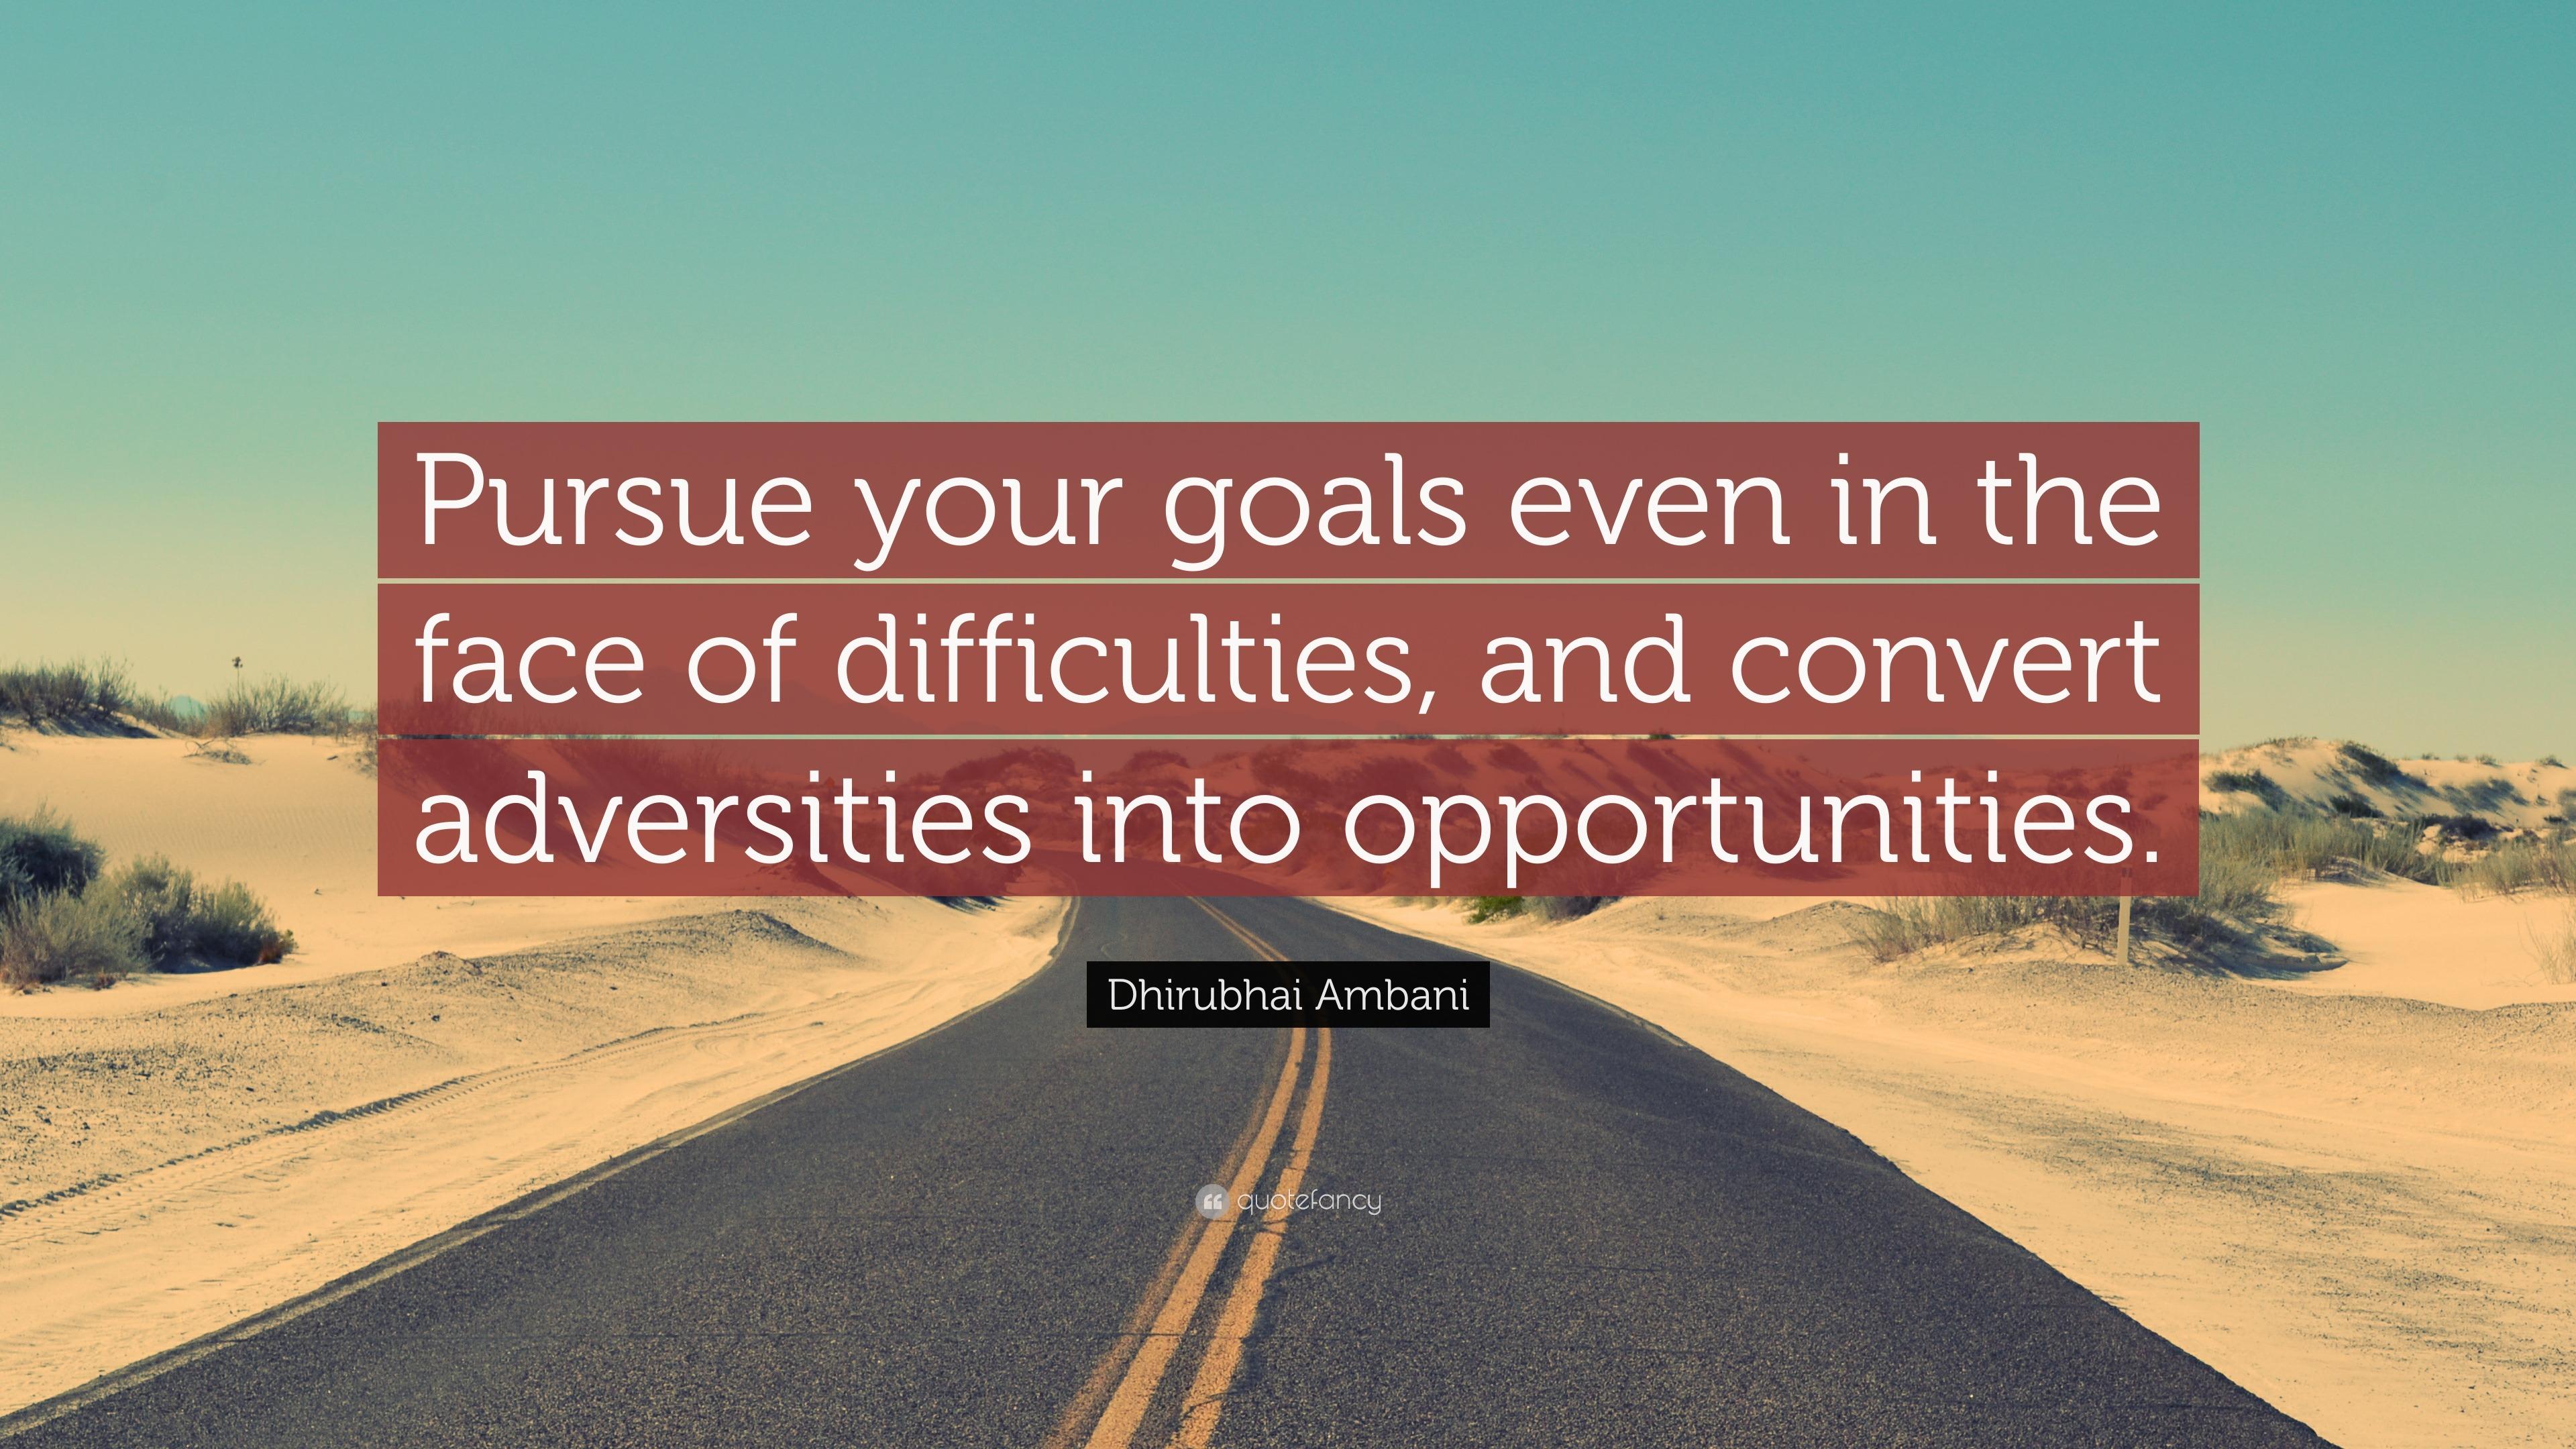 Dhirubhai Ambani Quotes Wallpaper Dhirubhai Ambani Quote Pursue Your Goals Even In The